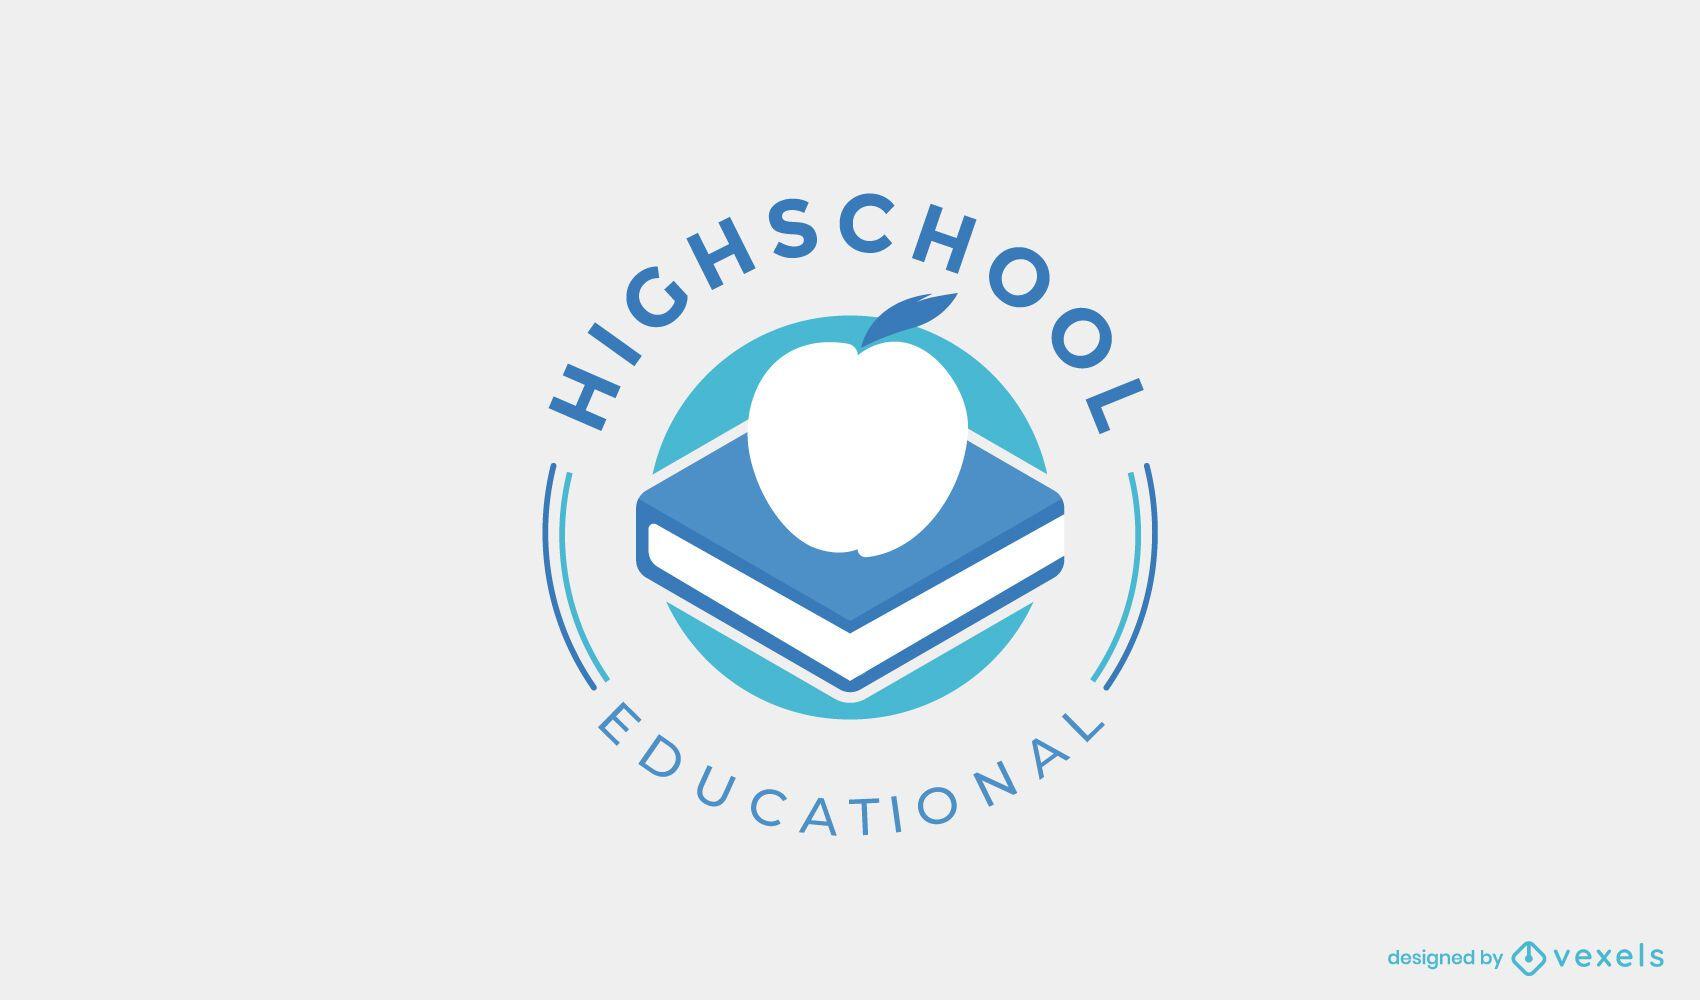 Highschool Library Logo Design